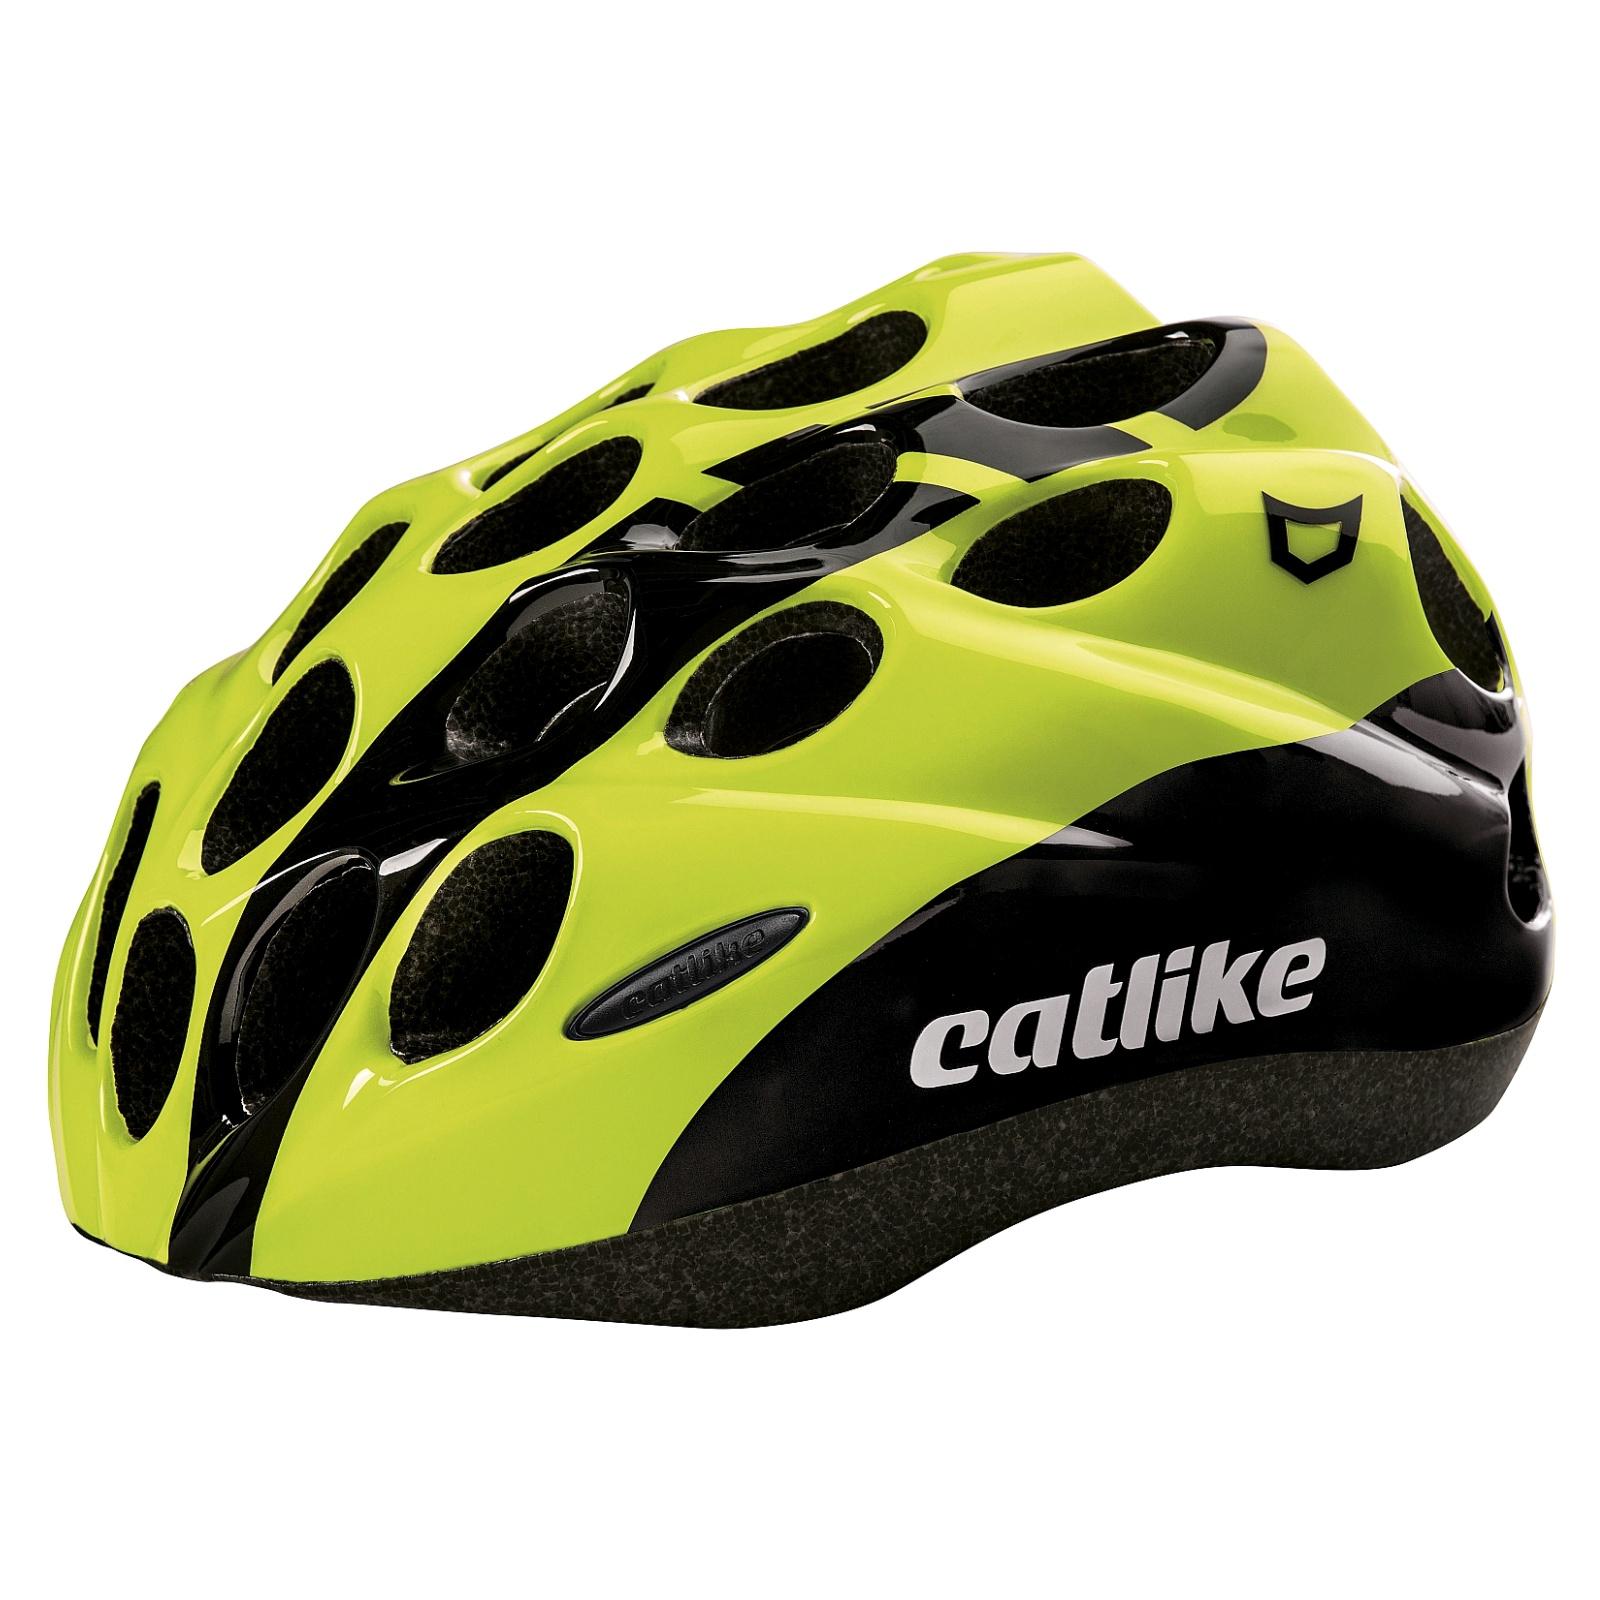 Cyklo přilba CATLIKE Kitten žlutá - vel. XS